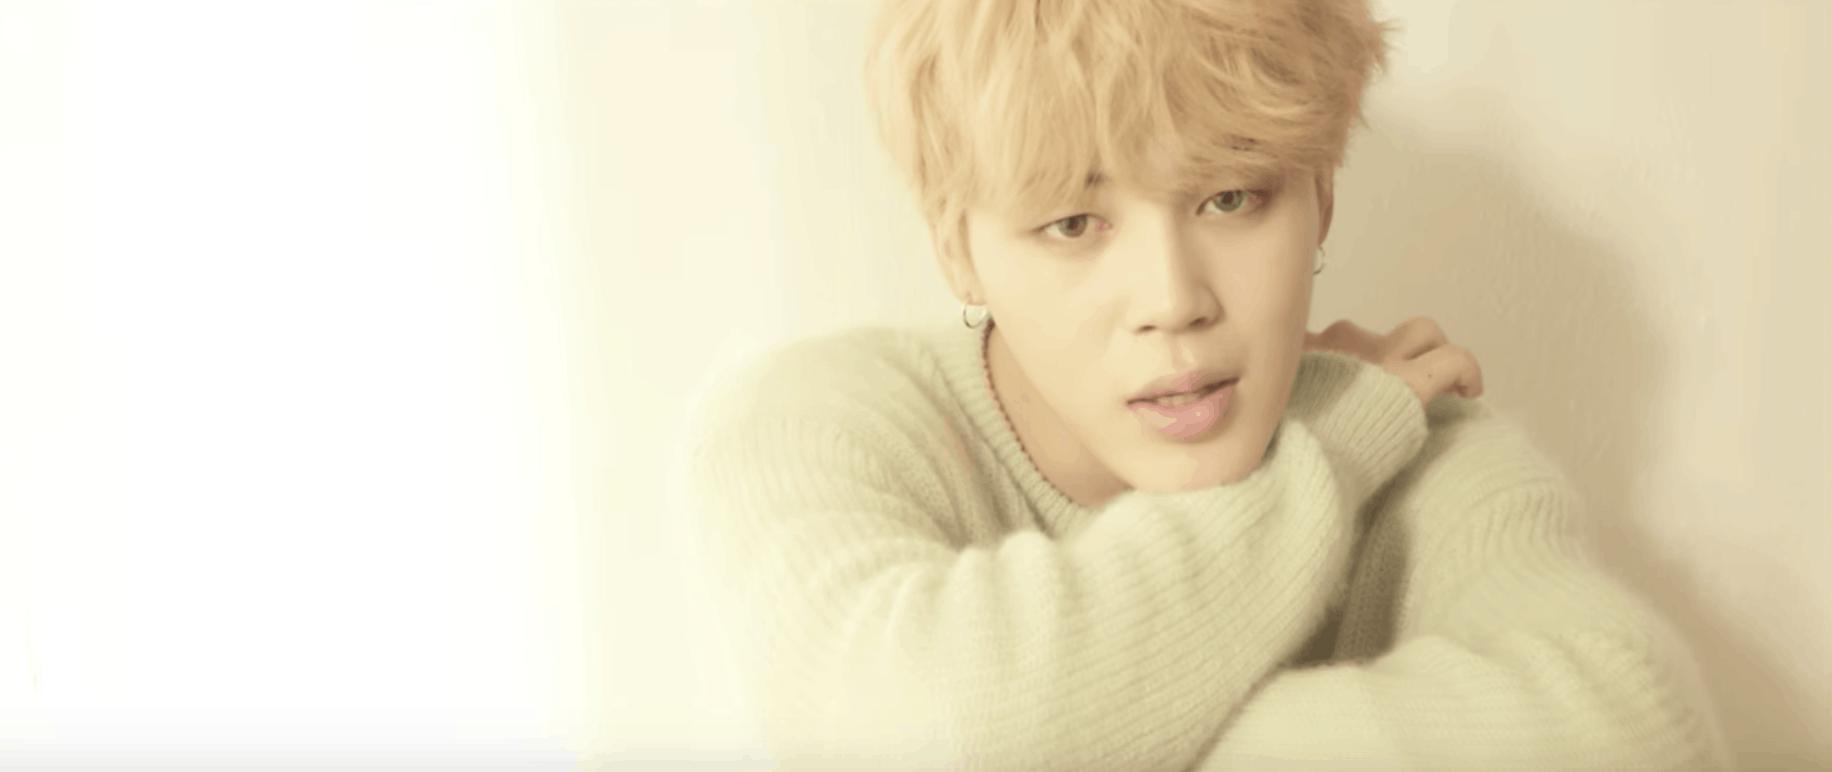 BTS Serendipity music video: Jimin wearing a fuzzy gray sweater